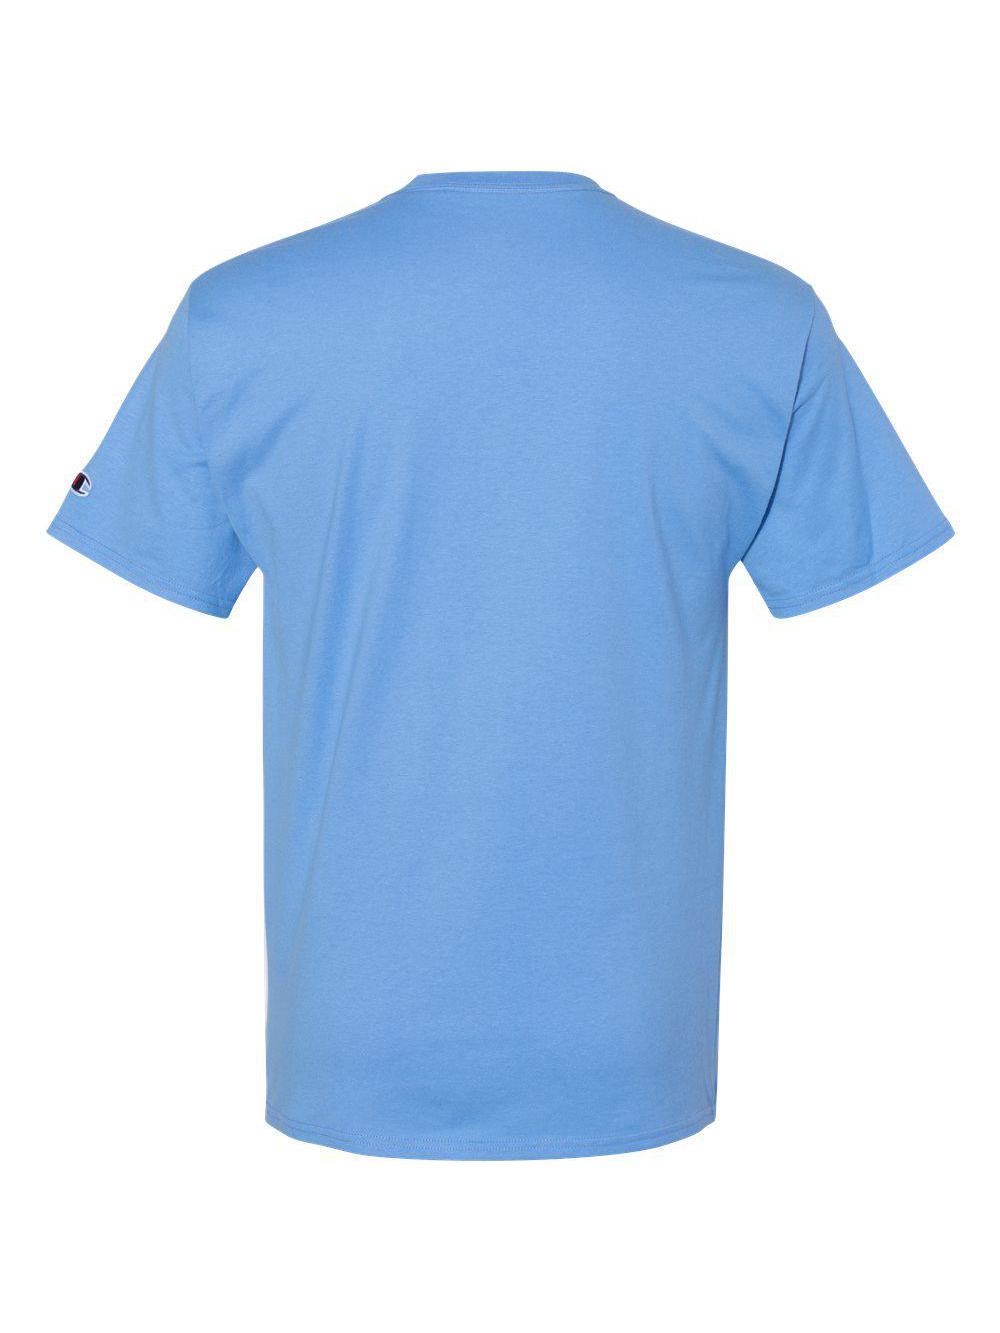 Champion-Premium-Classics-Short-Sleeve-T-Shirt-CP10 thumbnail 24